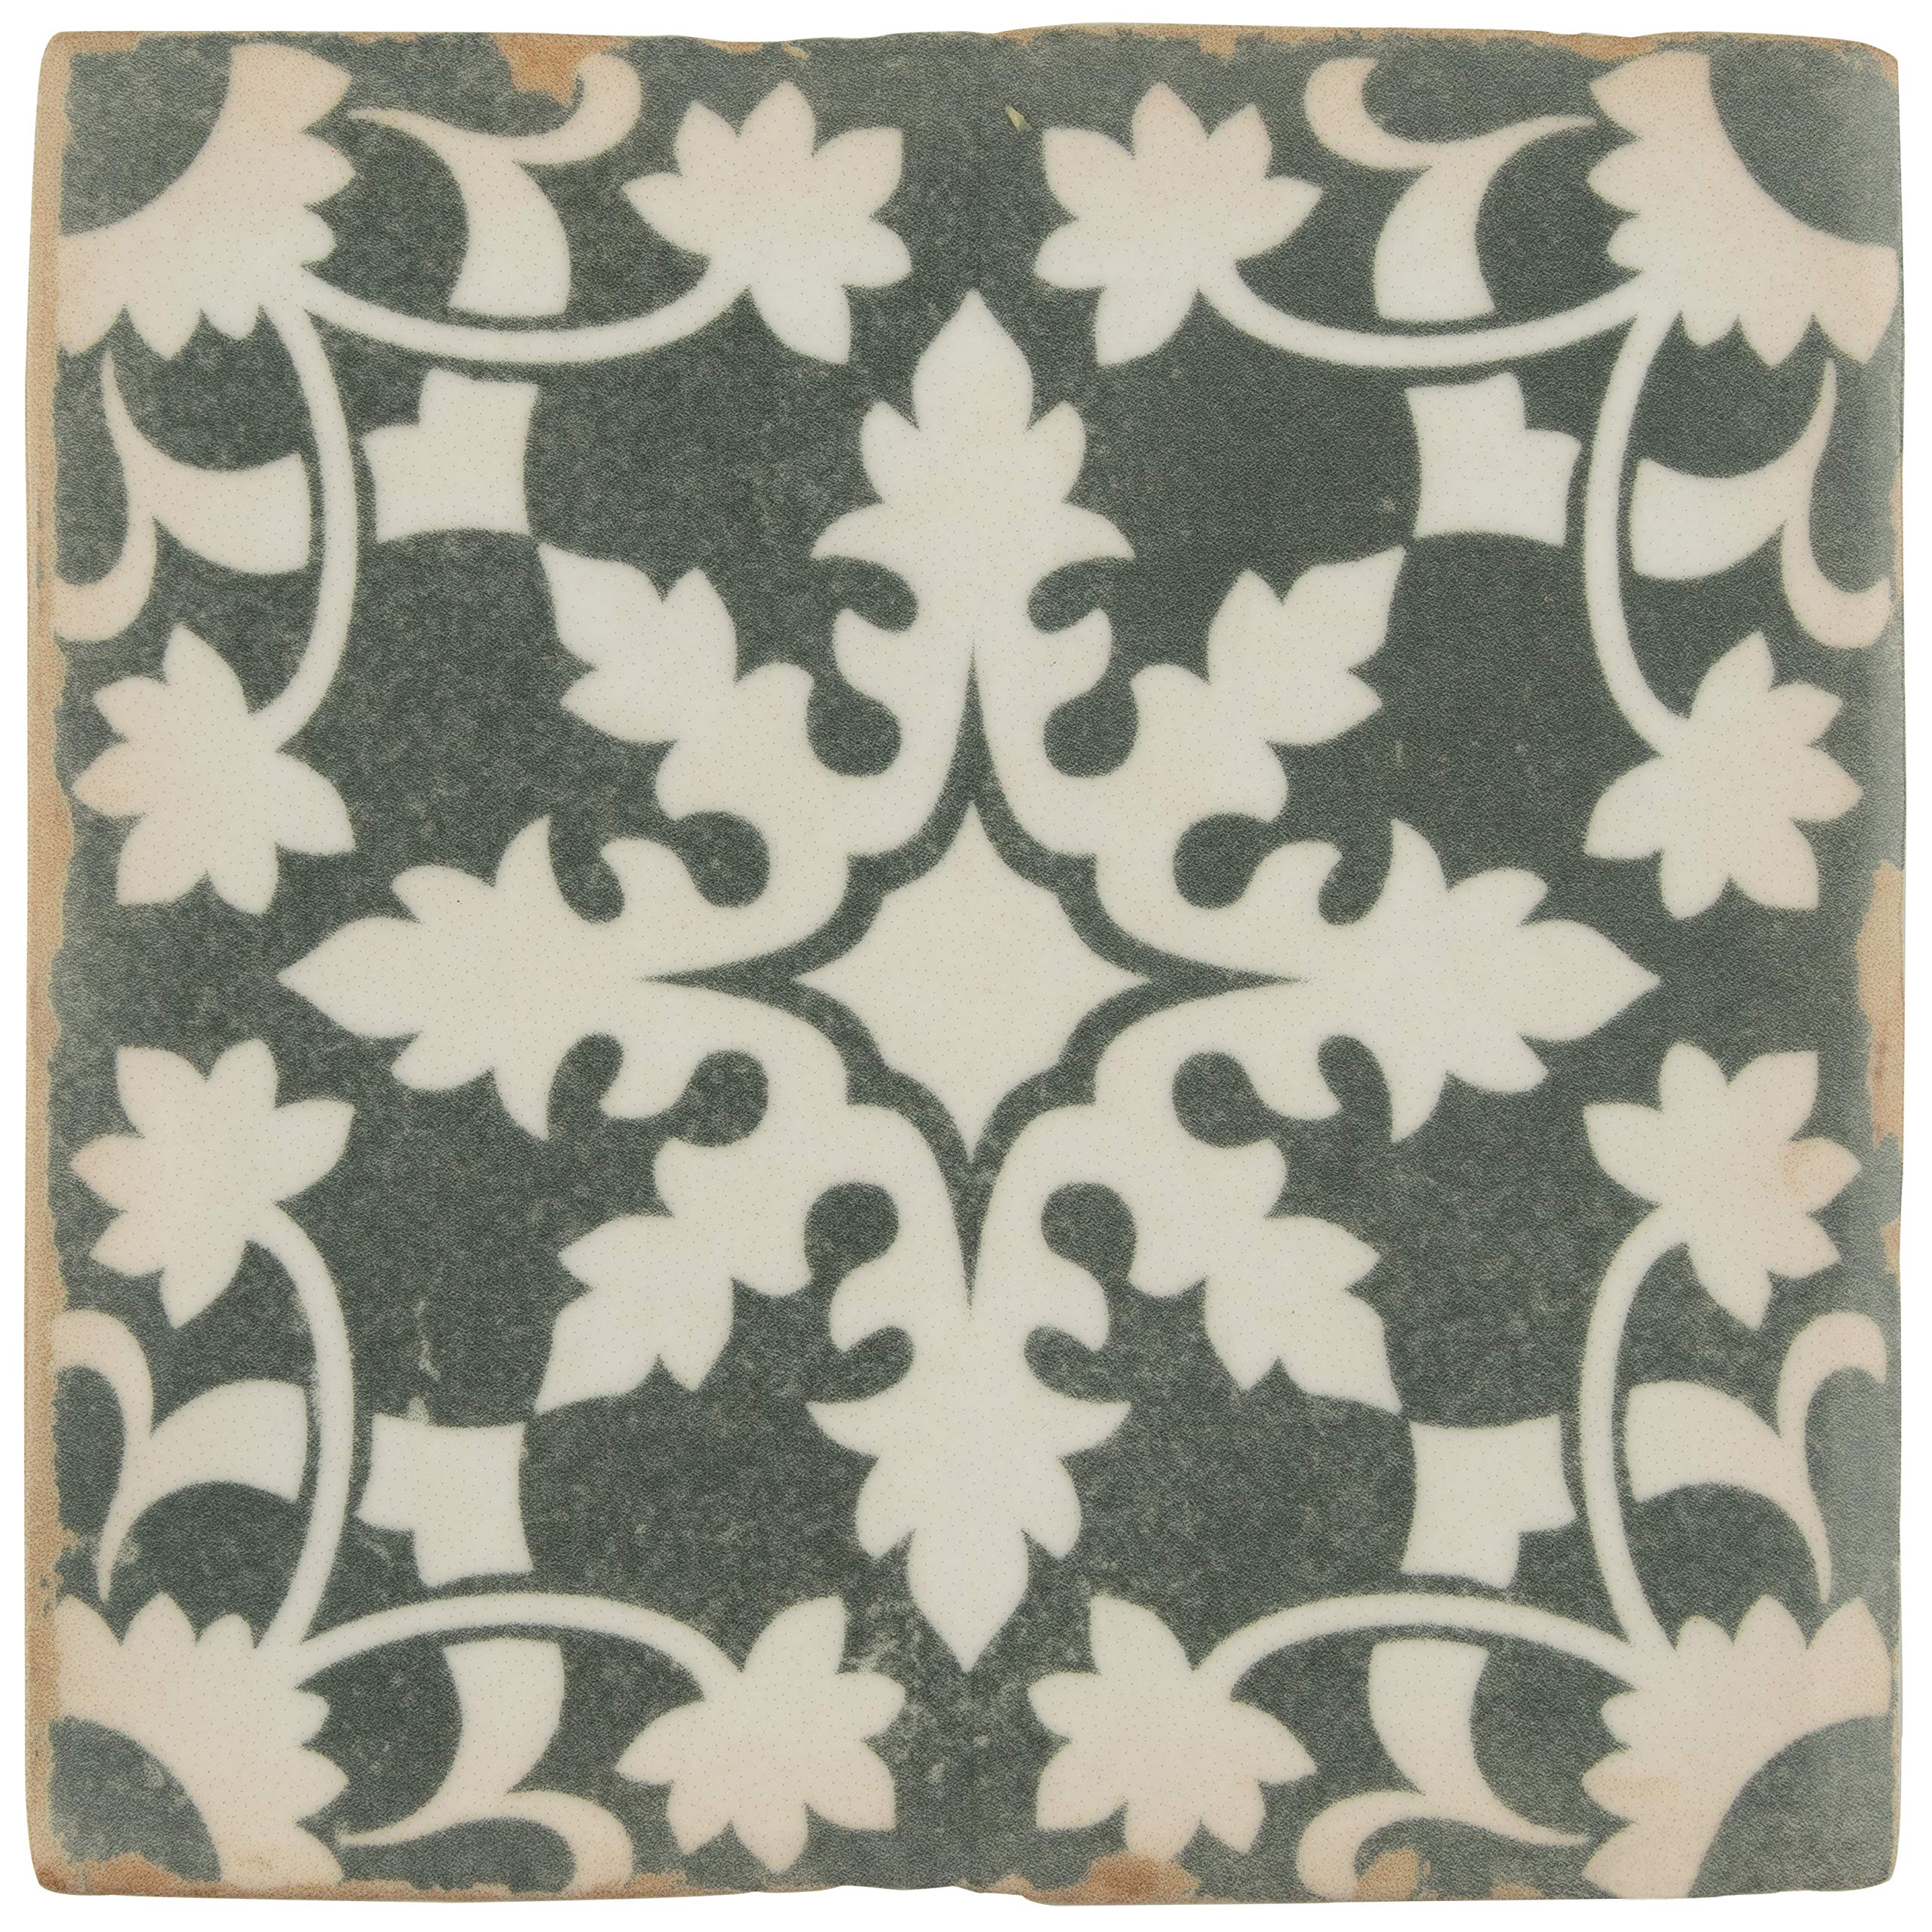 SomerTile FPEARCZH Modele Ceramic Floor and Wall Tile, 4.88'' x 4.88'', Zahra FPEARCZH Tile, 4.875'' x 4.875'', Grey/Cream/White/Brown, 32 Piece